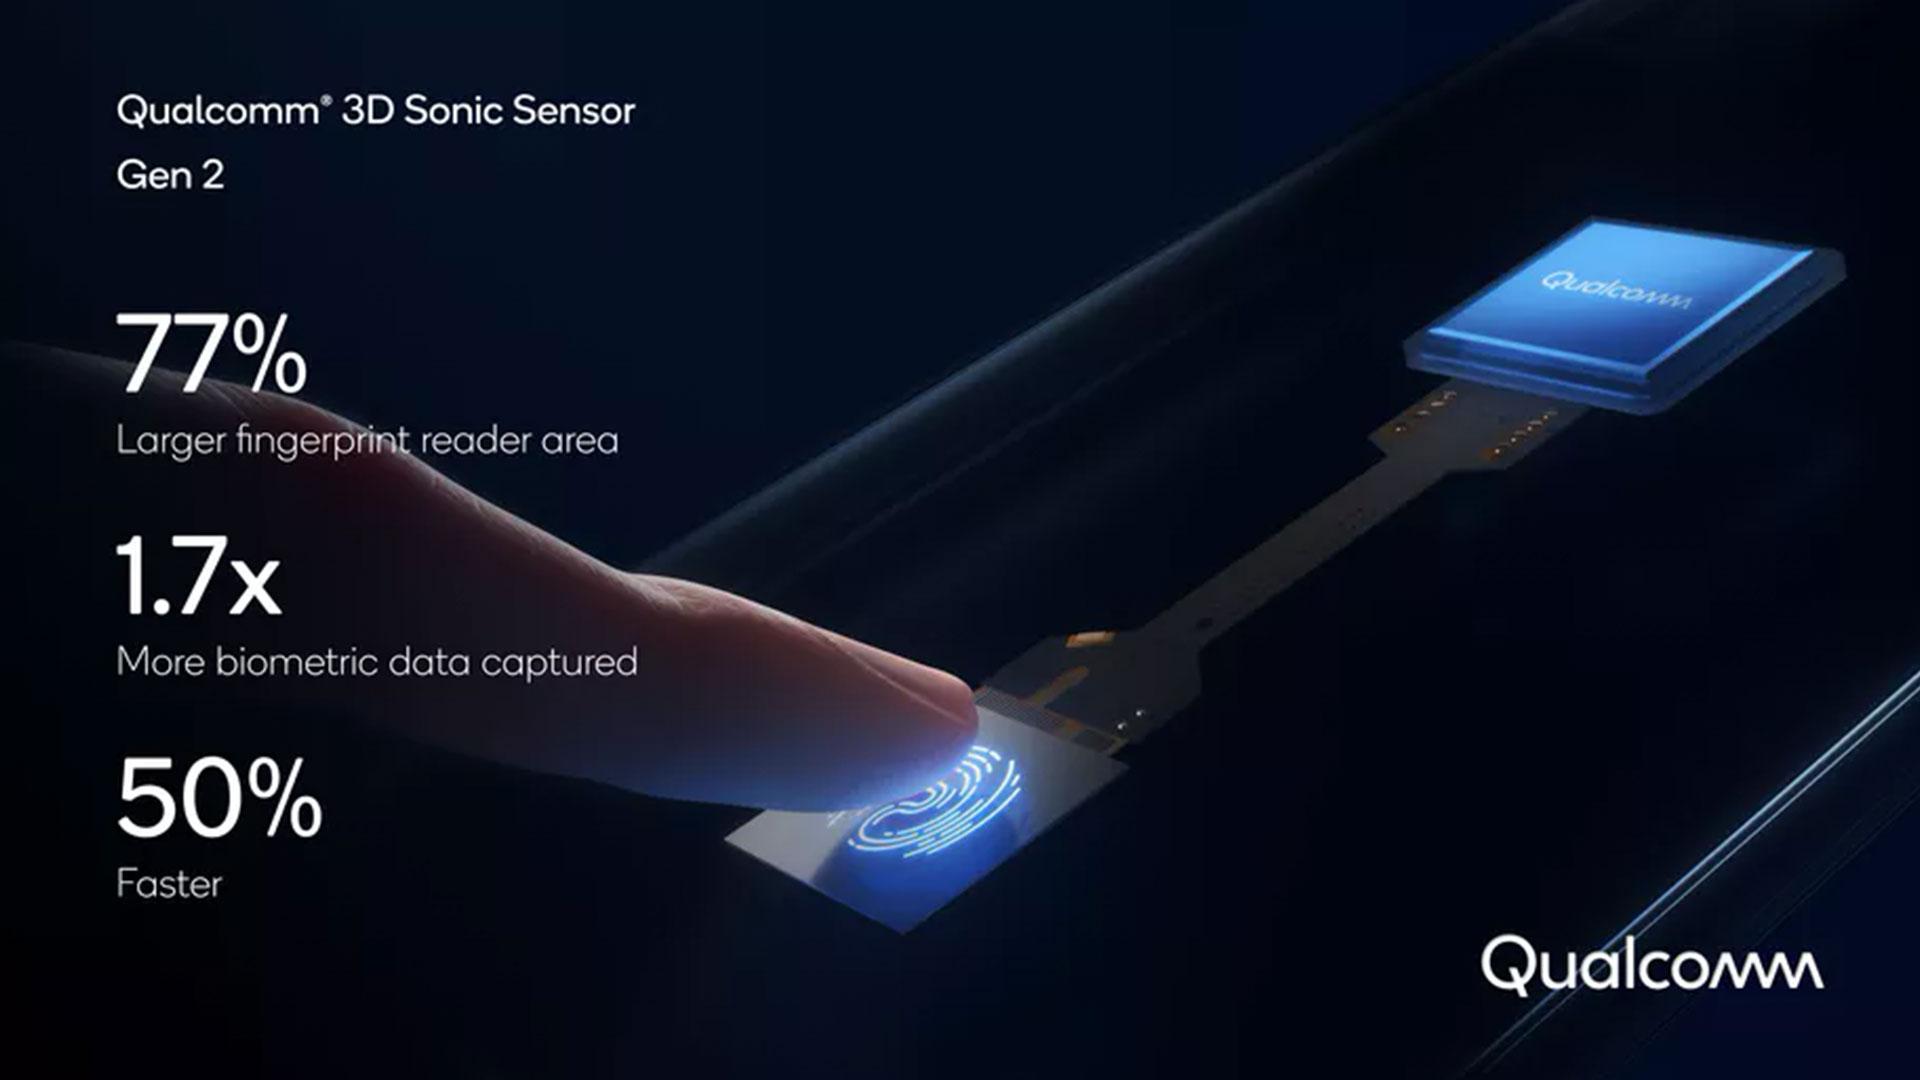 Qualcomm ikinci Nesil Ultrasonik Parmak izi Okuyucusunu Duyurdu 2